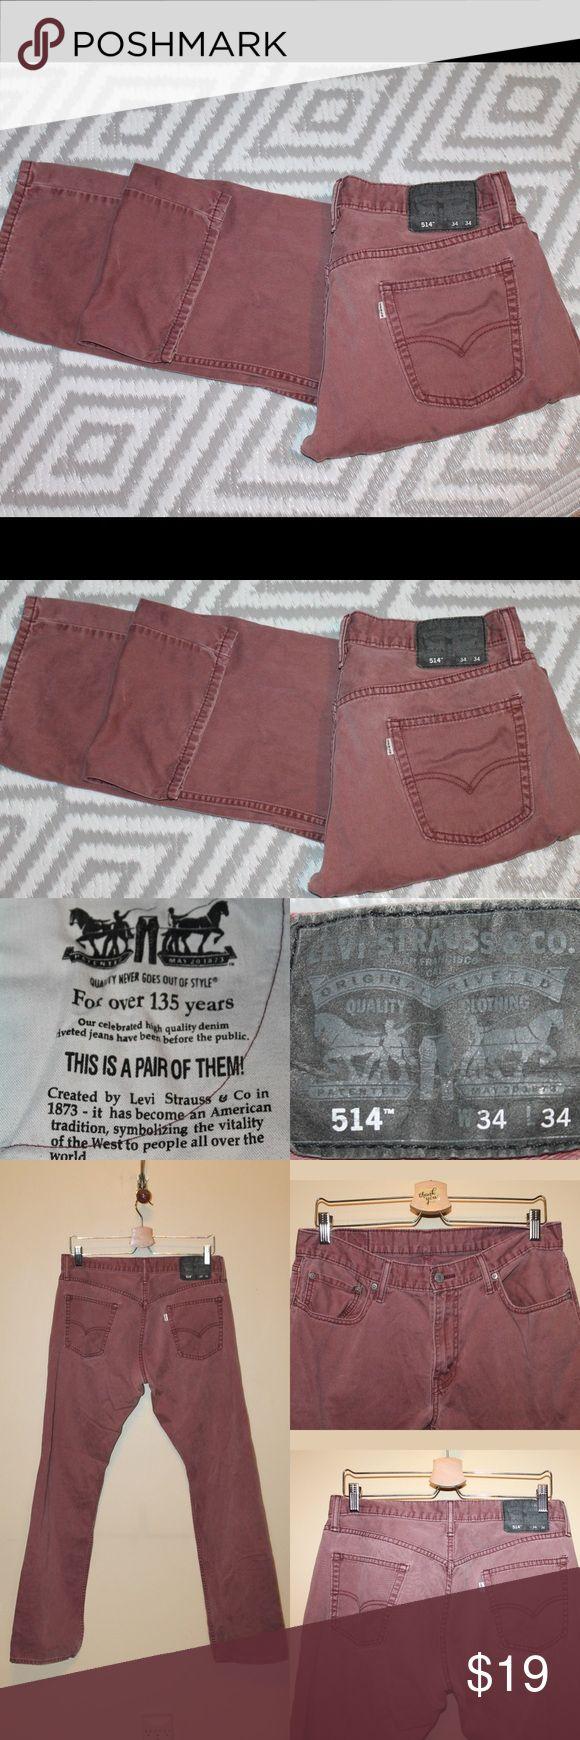 LEVI'S 514 Maroon Jeans Maroon Denim wash jeans Levi's 514 34x34 Levi's Jeans Bootcut